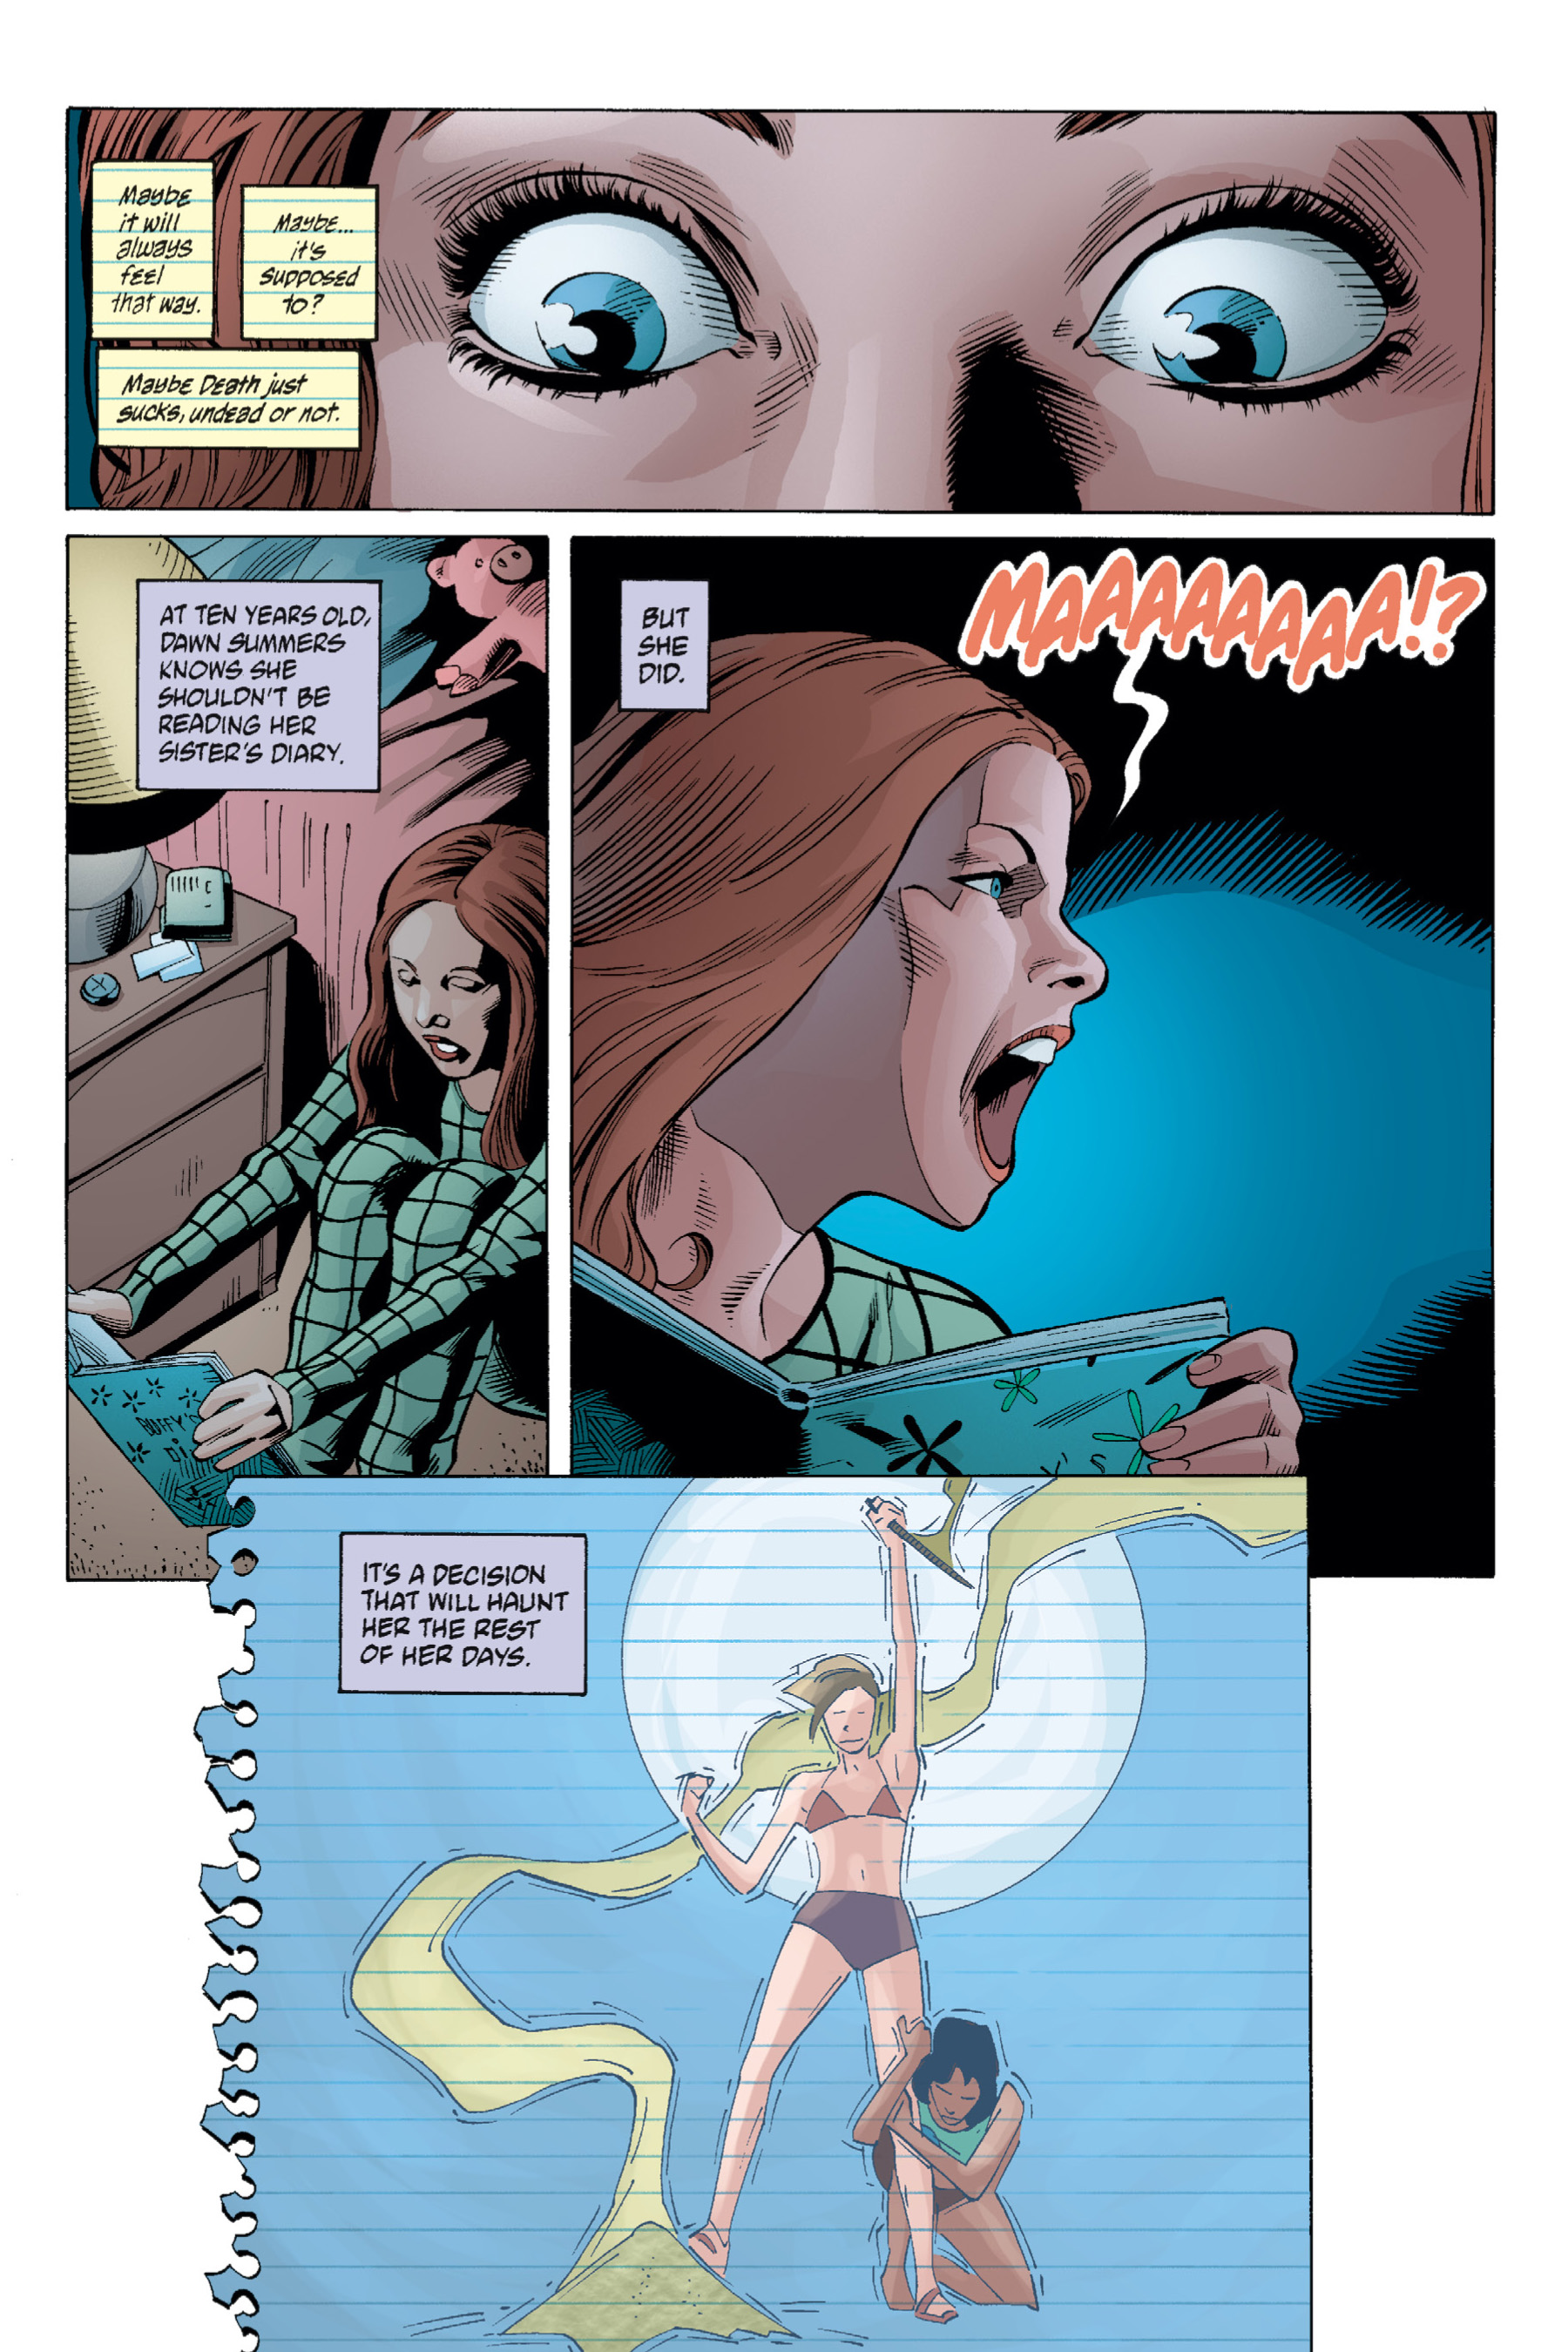 Read online Buffy the Vampire Slayer: Omnibus comic -  Issue # TPB 1 - 217